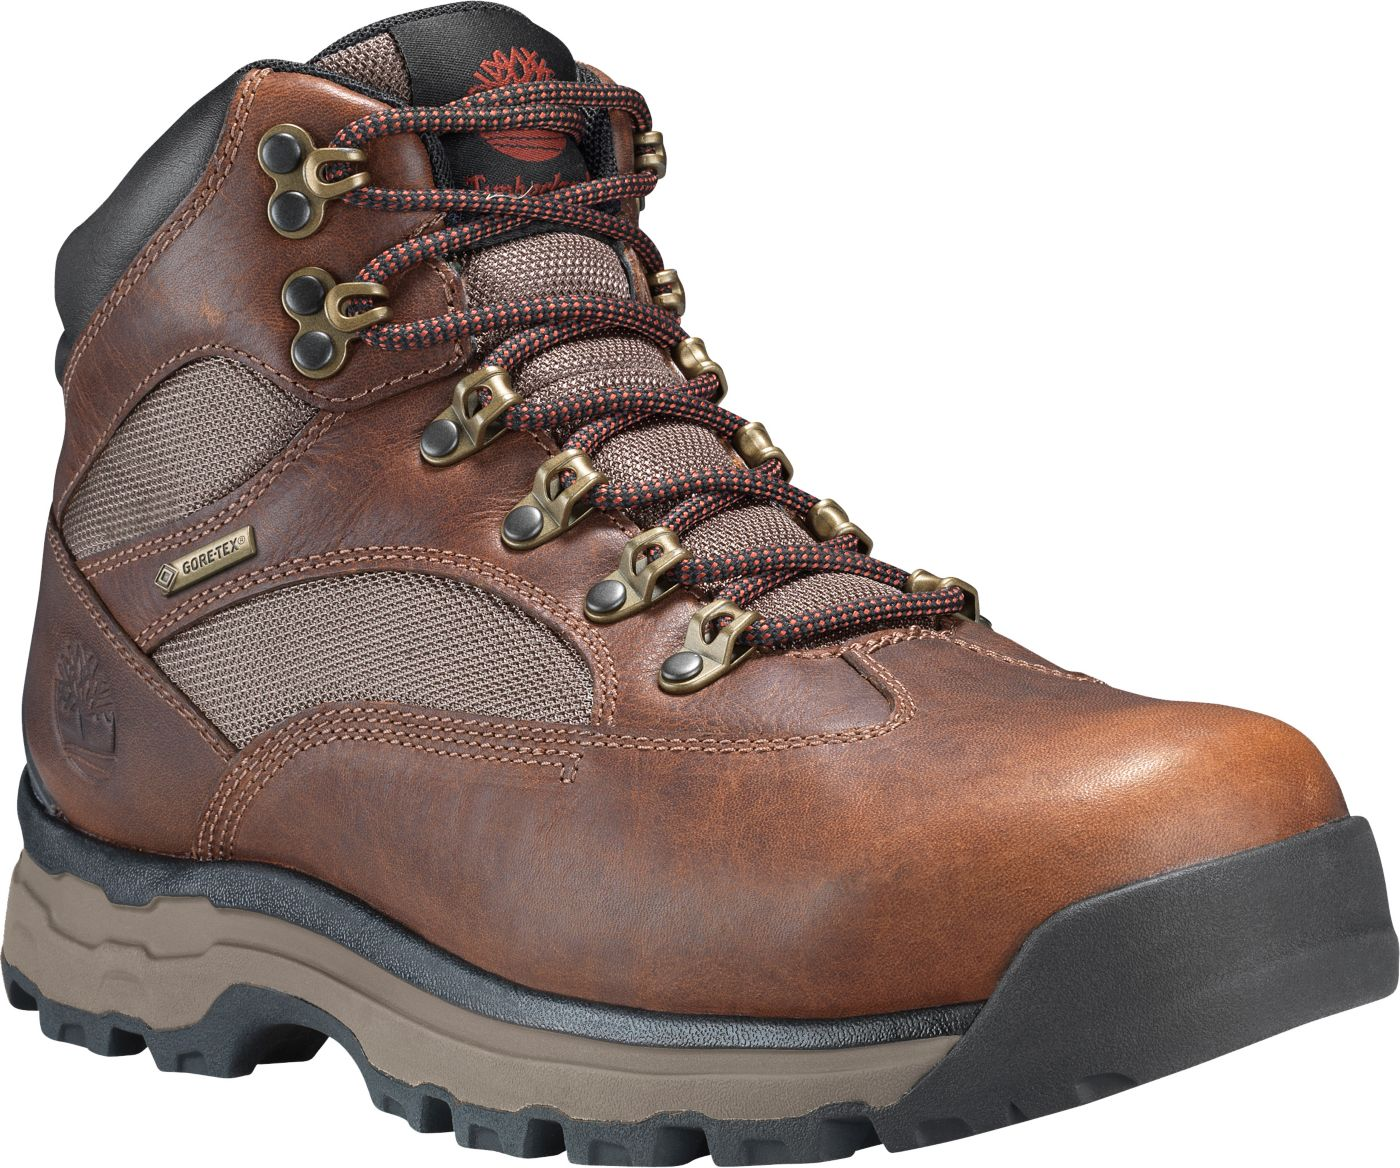 Timberland Men's Chocorua Trail 2.0 Mid GORE-TEX Hiking Boots